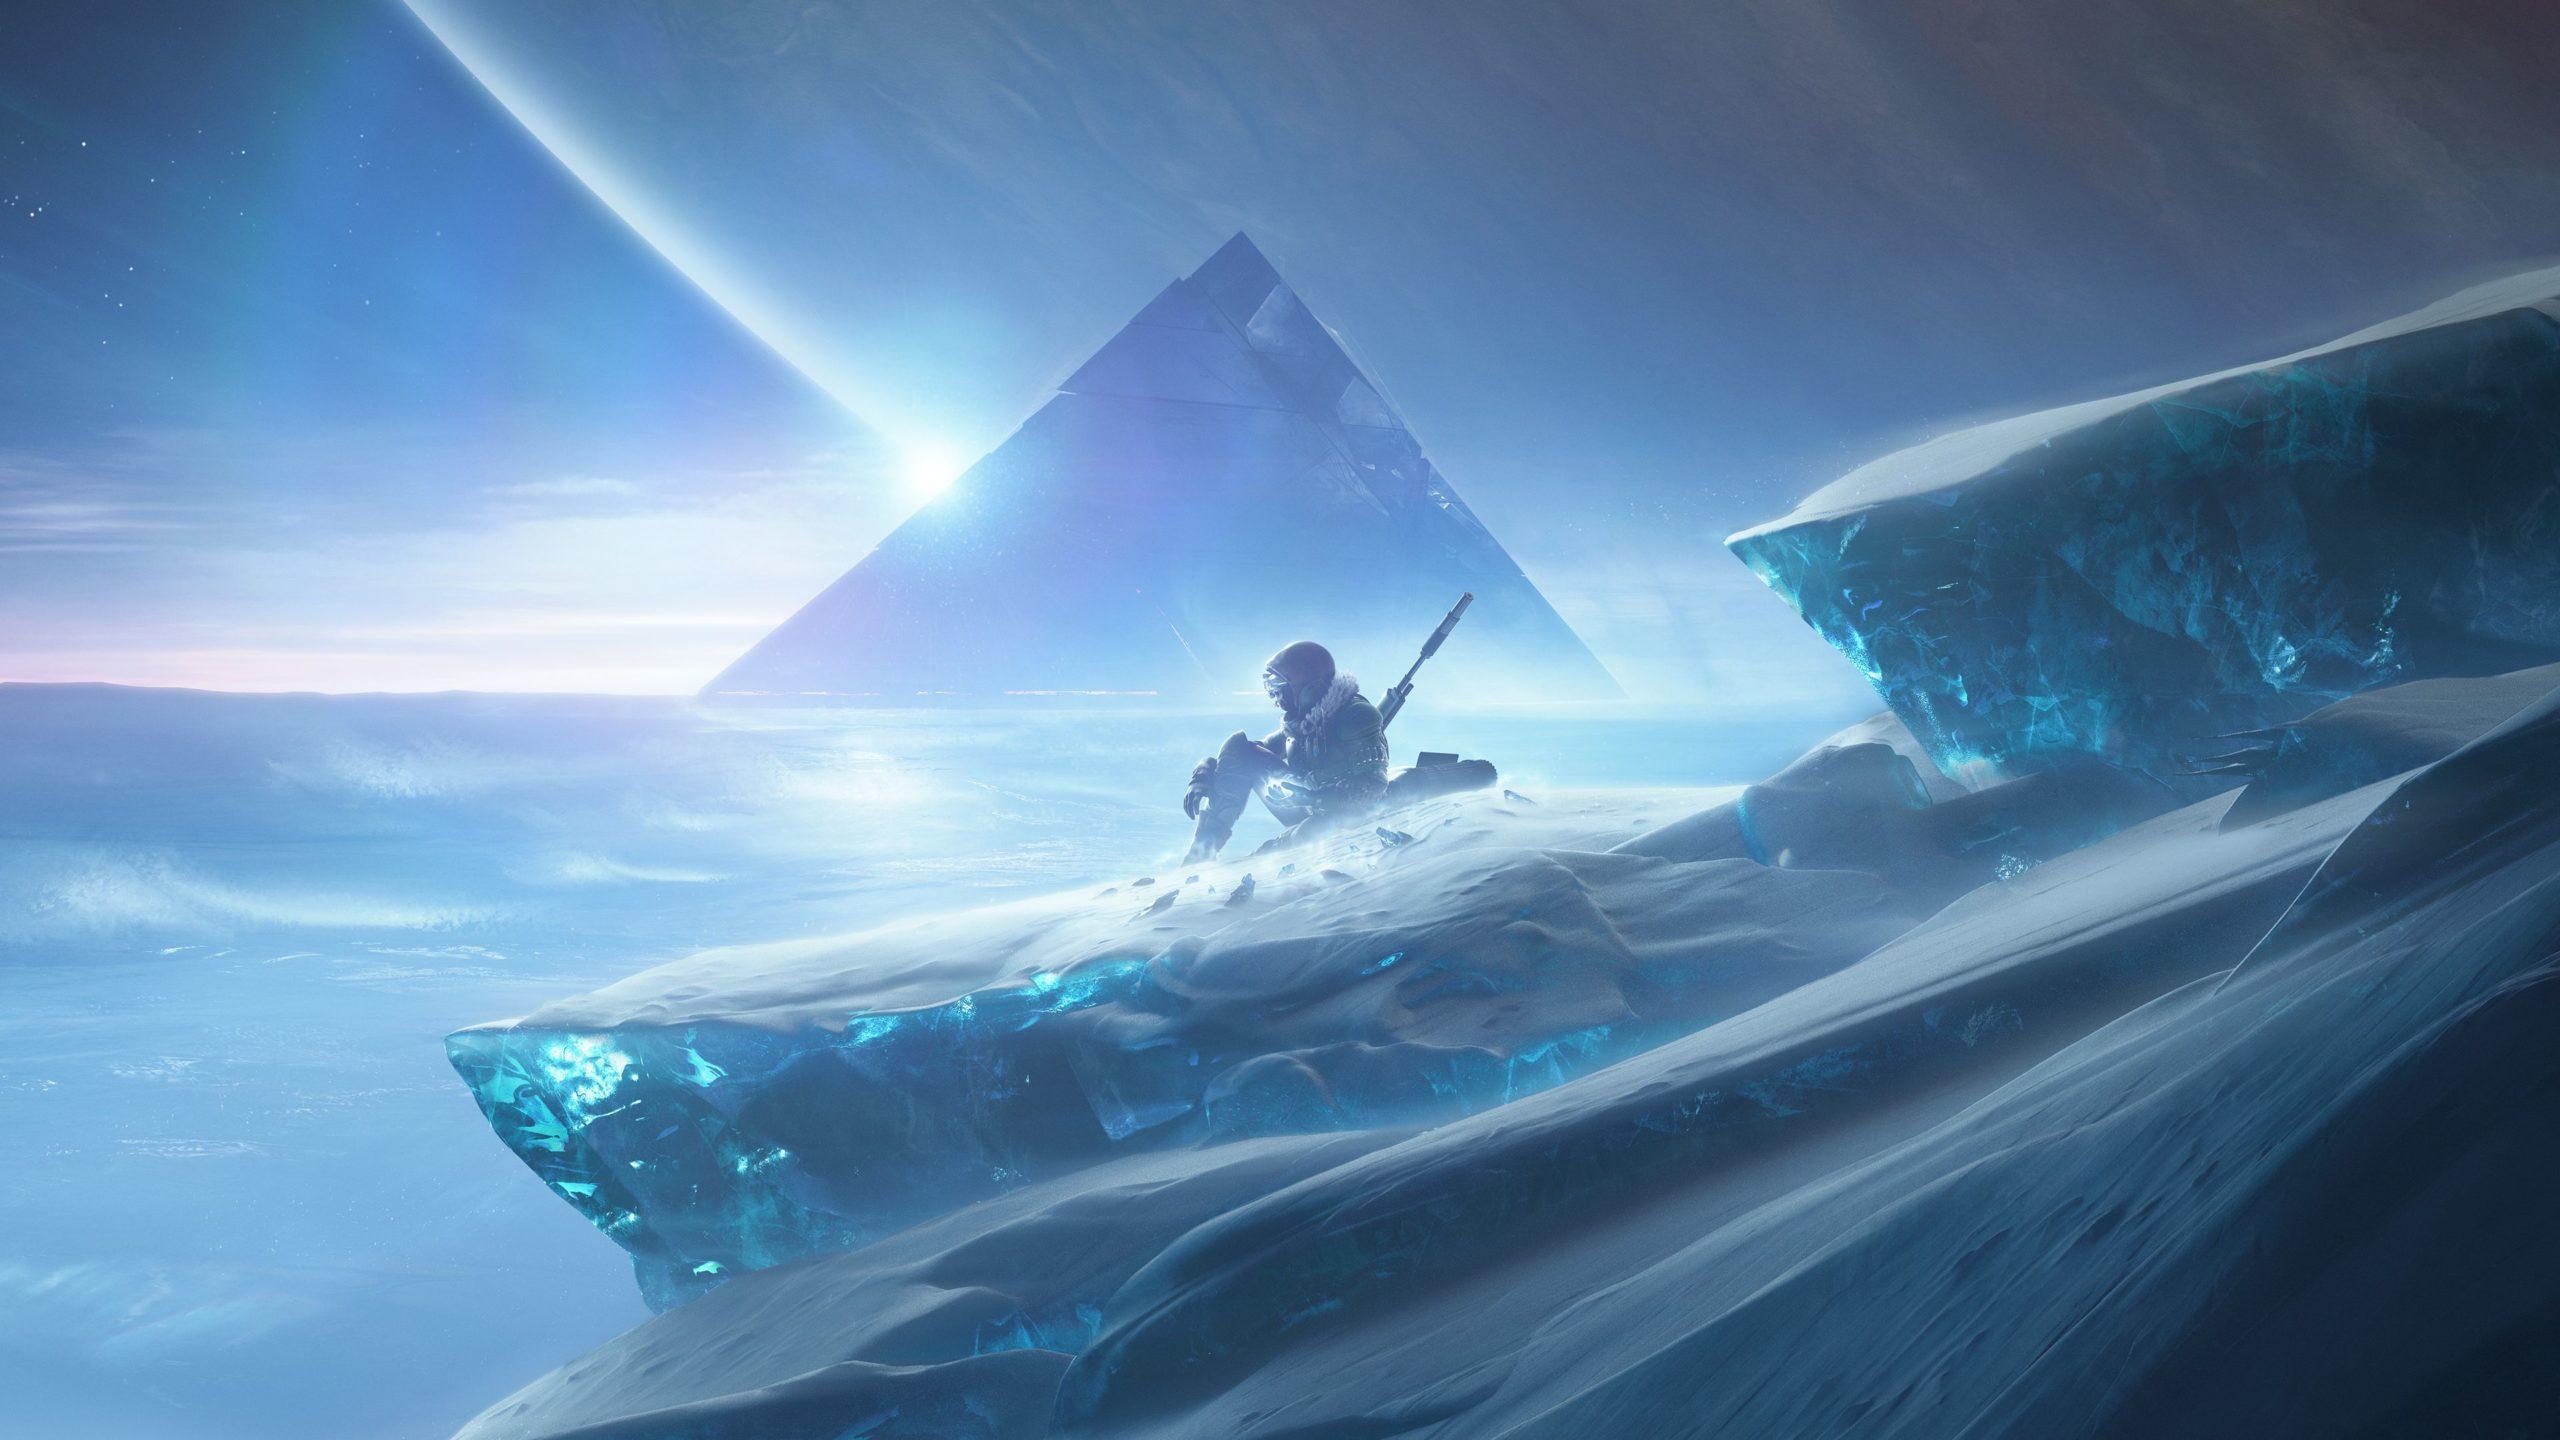 Multiplayer v Destiny 2 poběží na konzolích Xbox Series X a PS5 ve 120fps